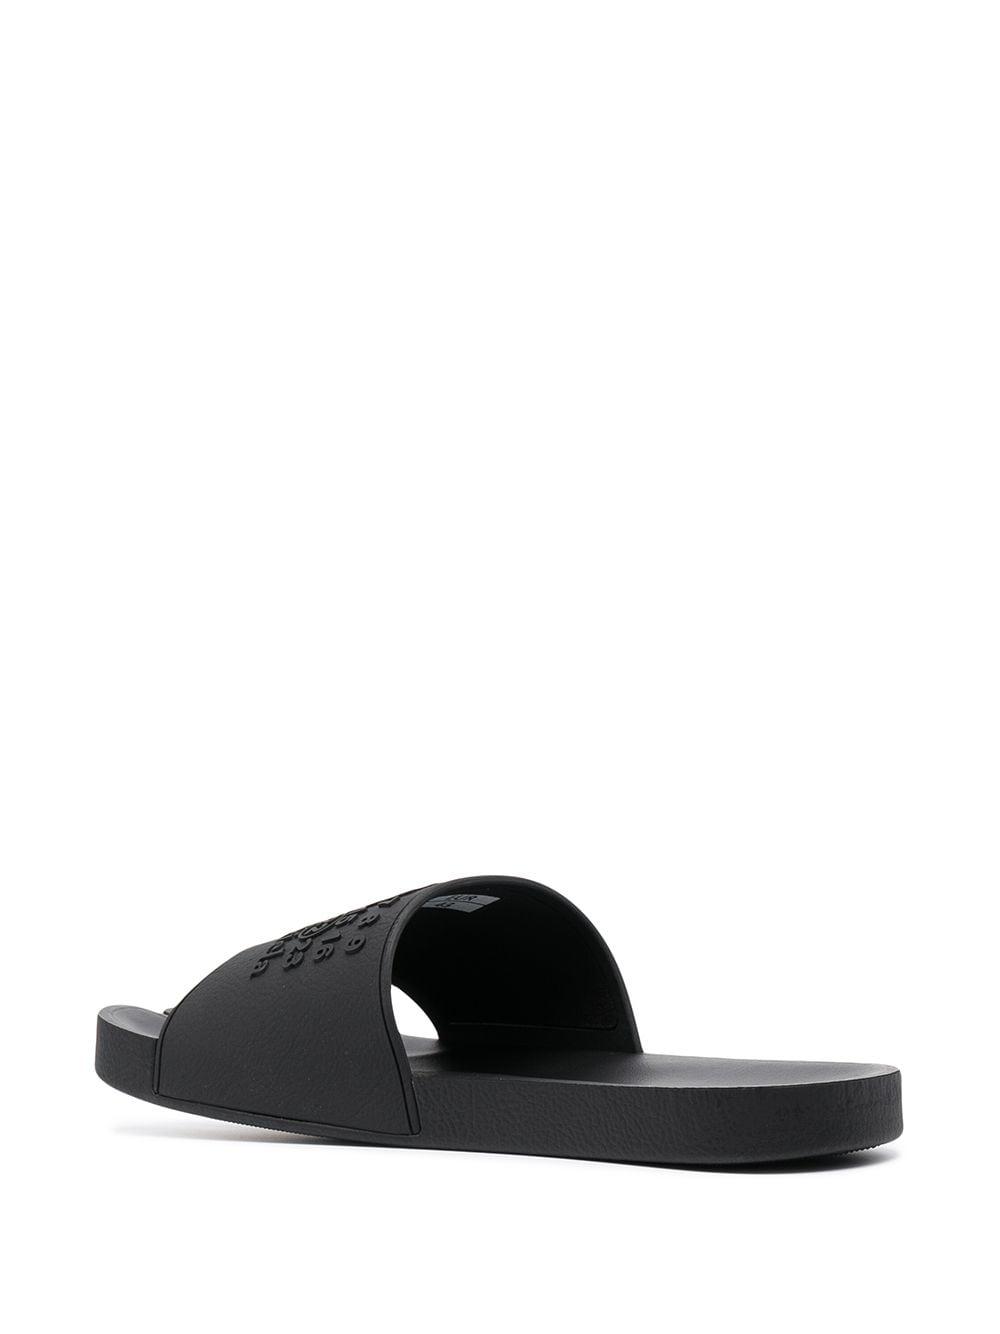 Maison Margiela sandalo slide tabi uomo MAISON MARGIELA   Sandali   S57WX0075 P4027T8008